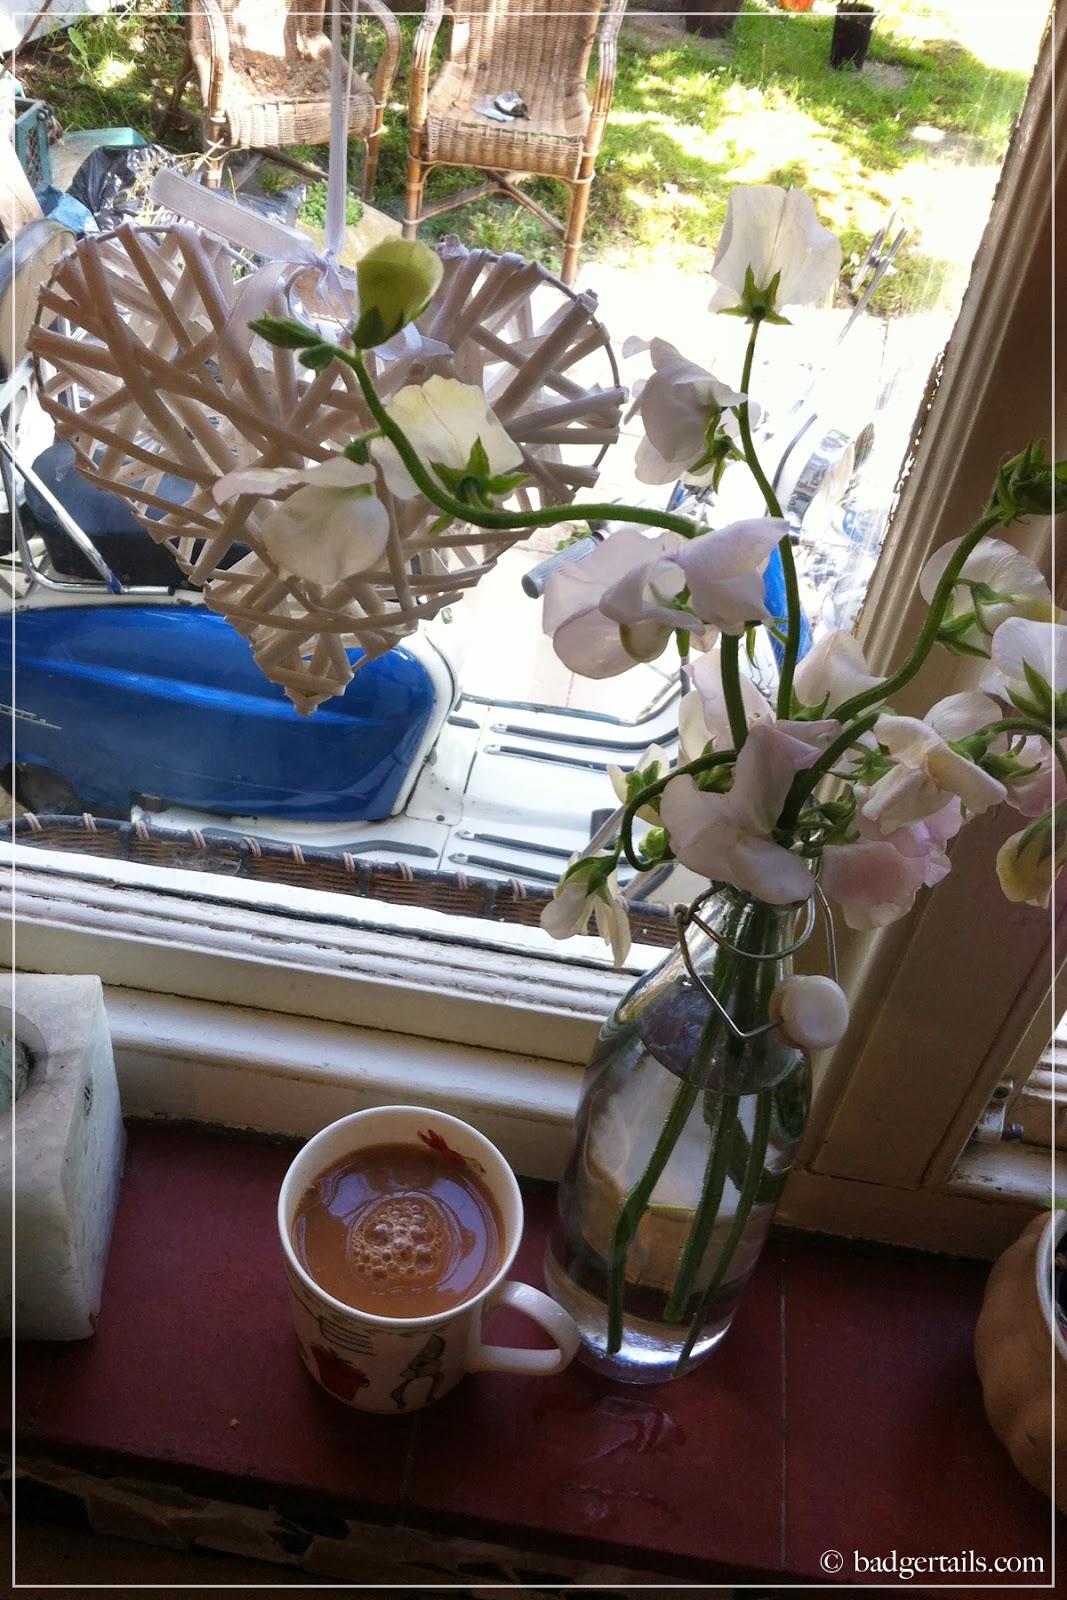 sweet peas and english tea on window sill in summer